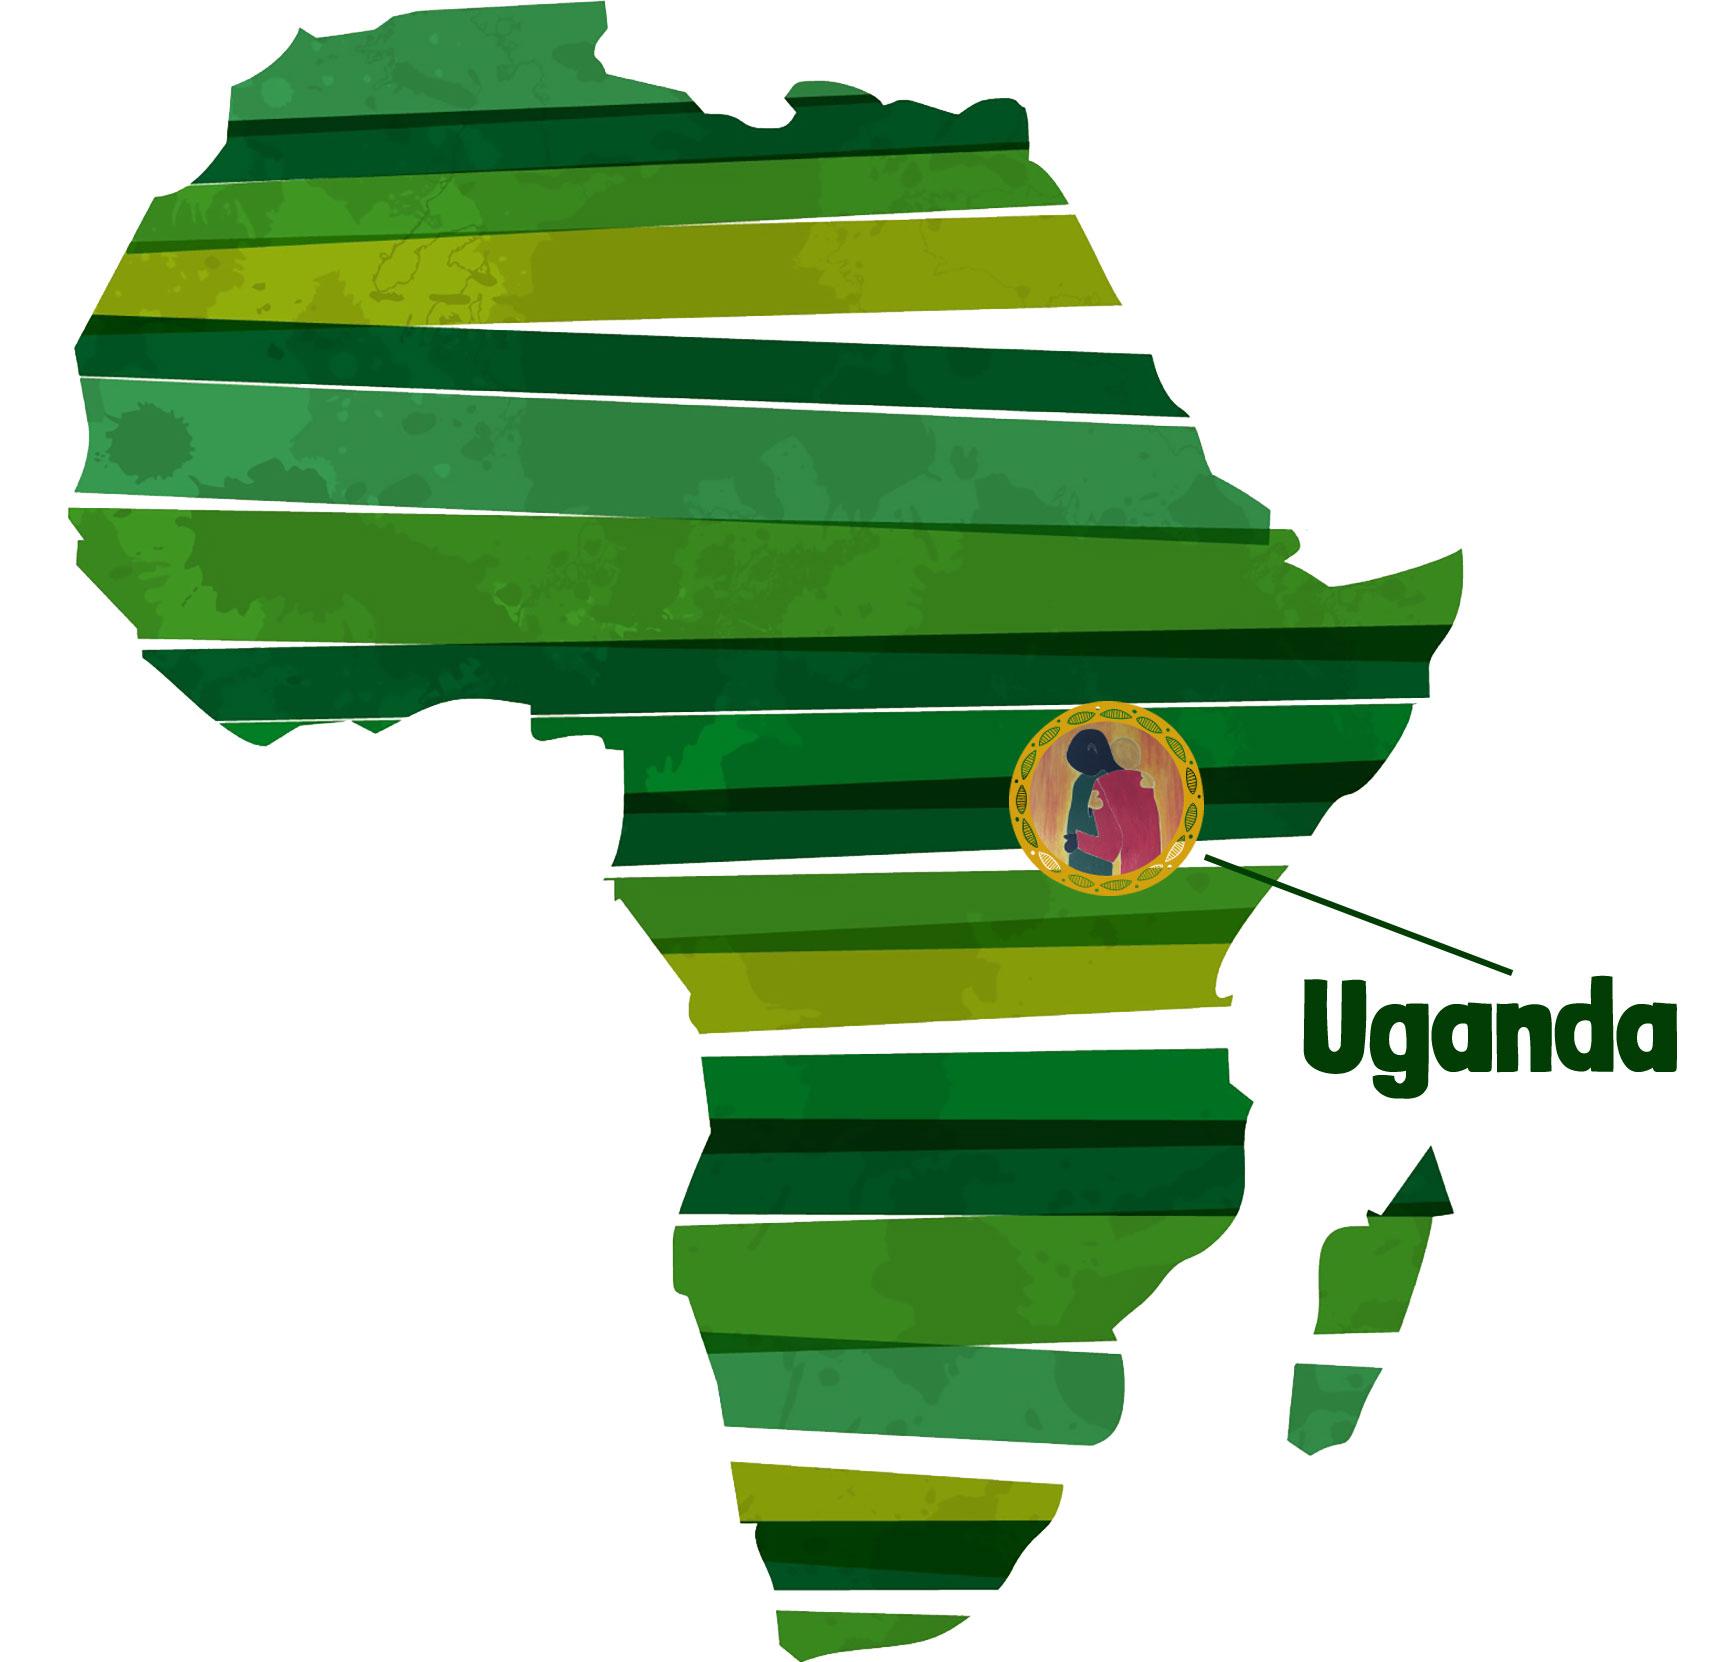 africa-map-uganda.jpg